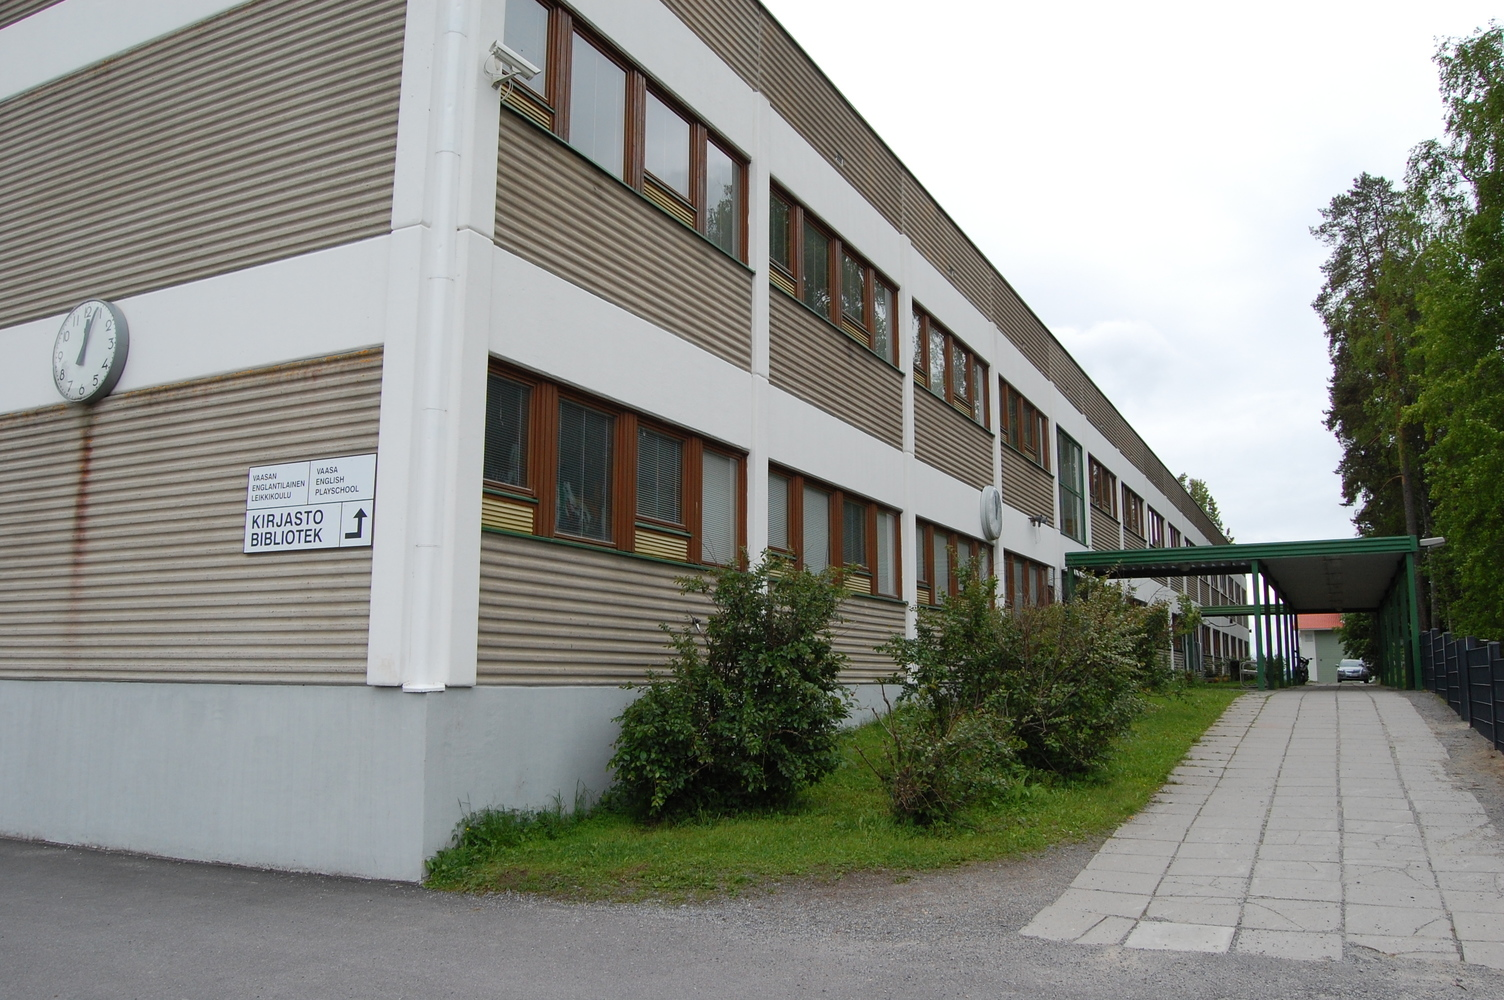 Suvilahti library